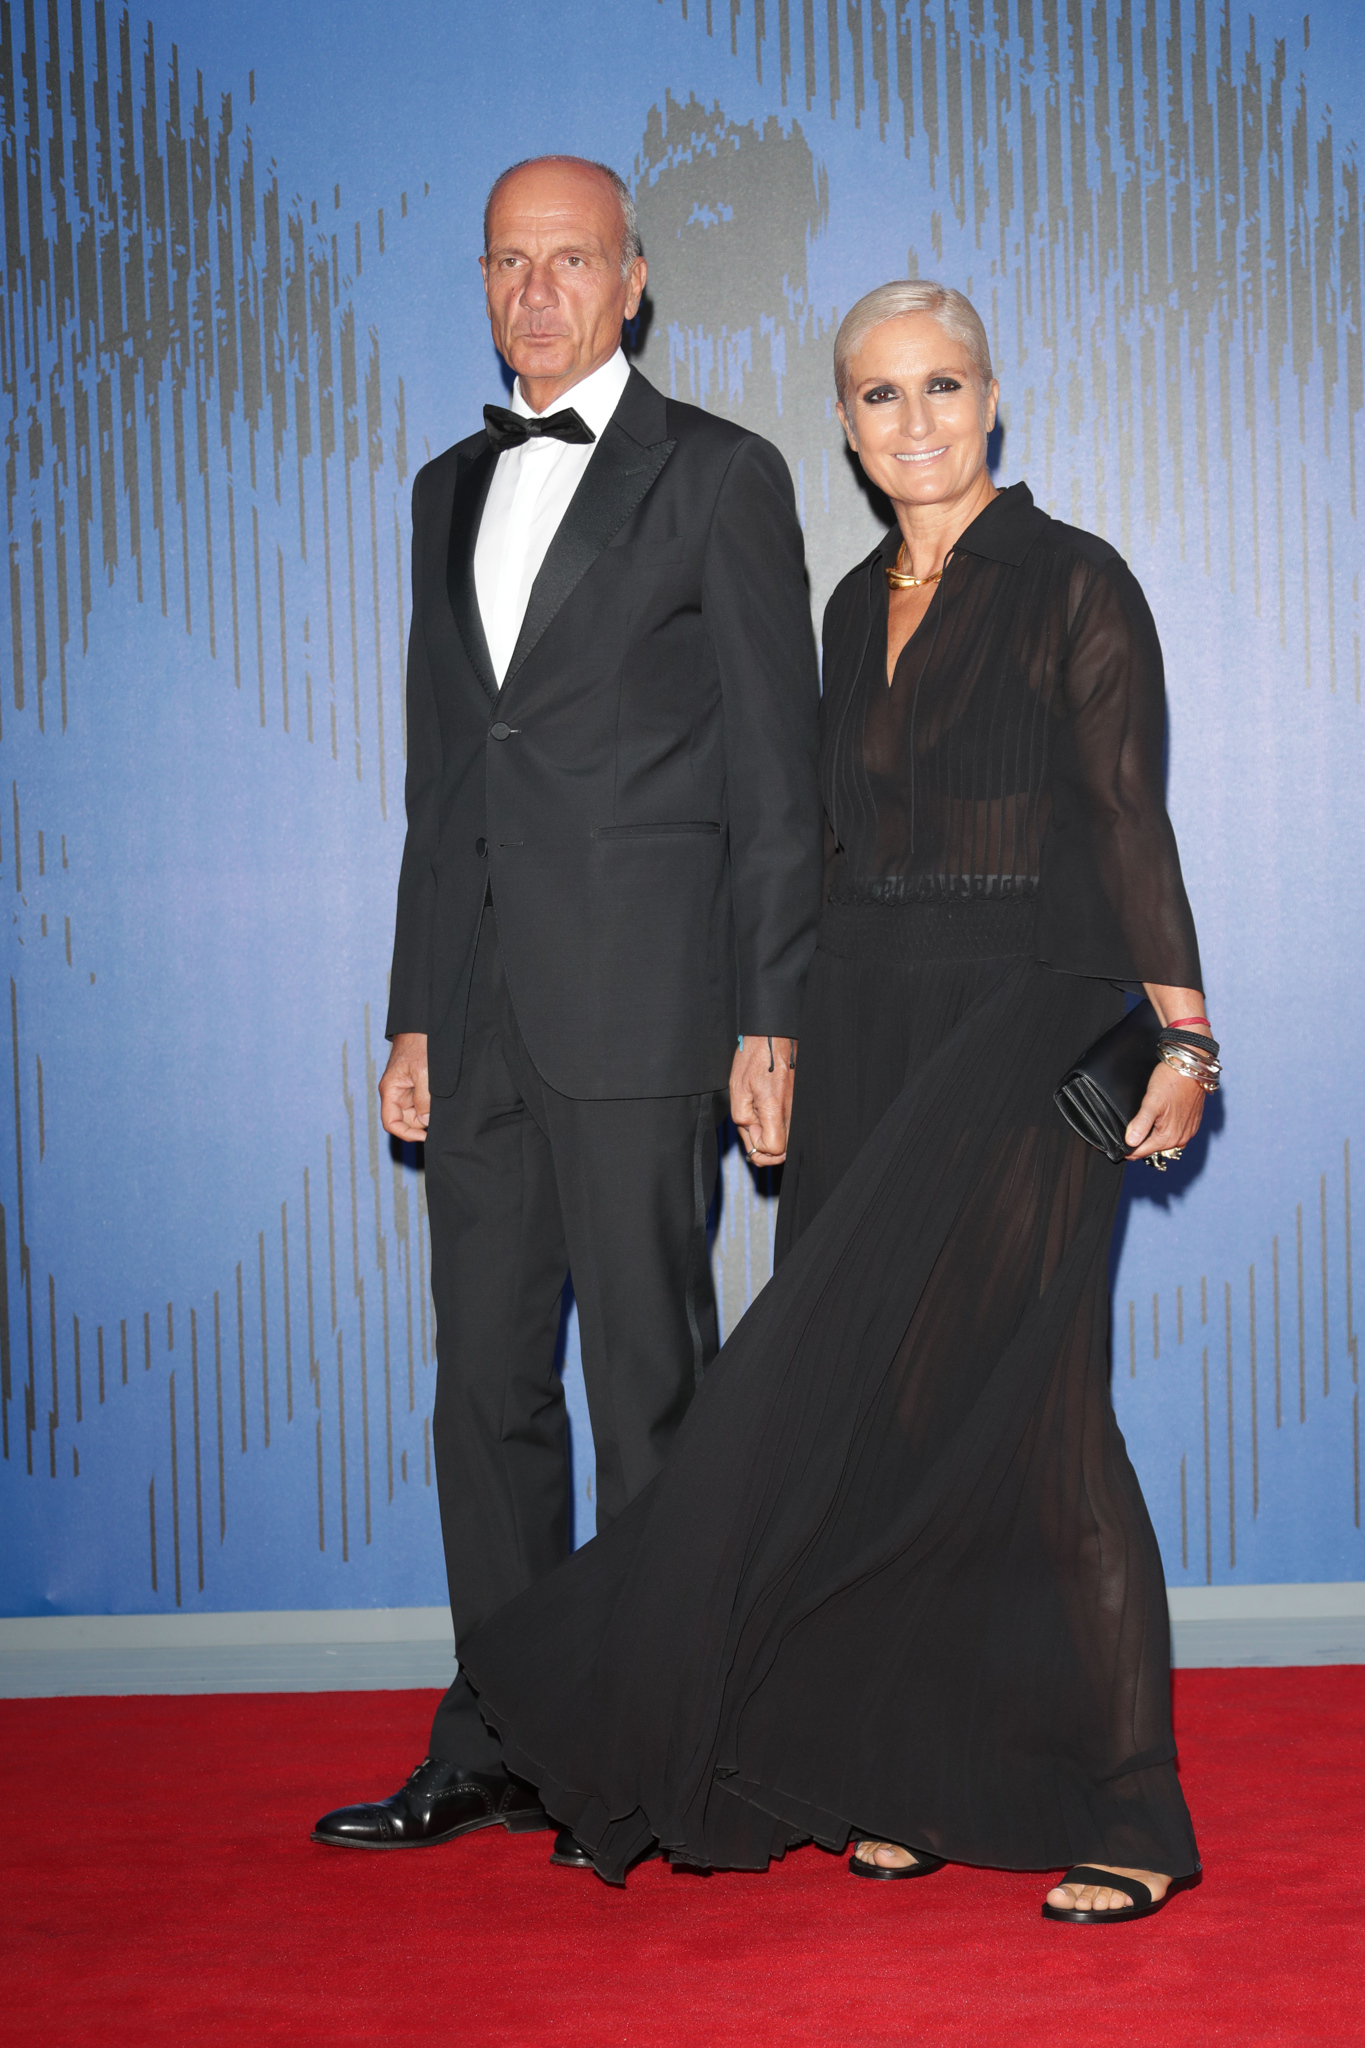 Maria Grazia ChiuriThe Franca Sozzani Award, 74th Venice Film Festival, Venice, Italy - 01 Sep 2017